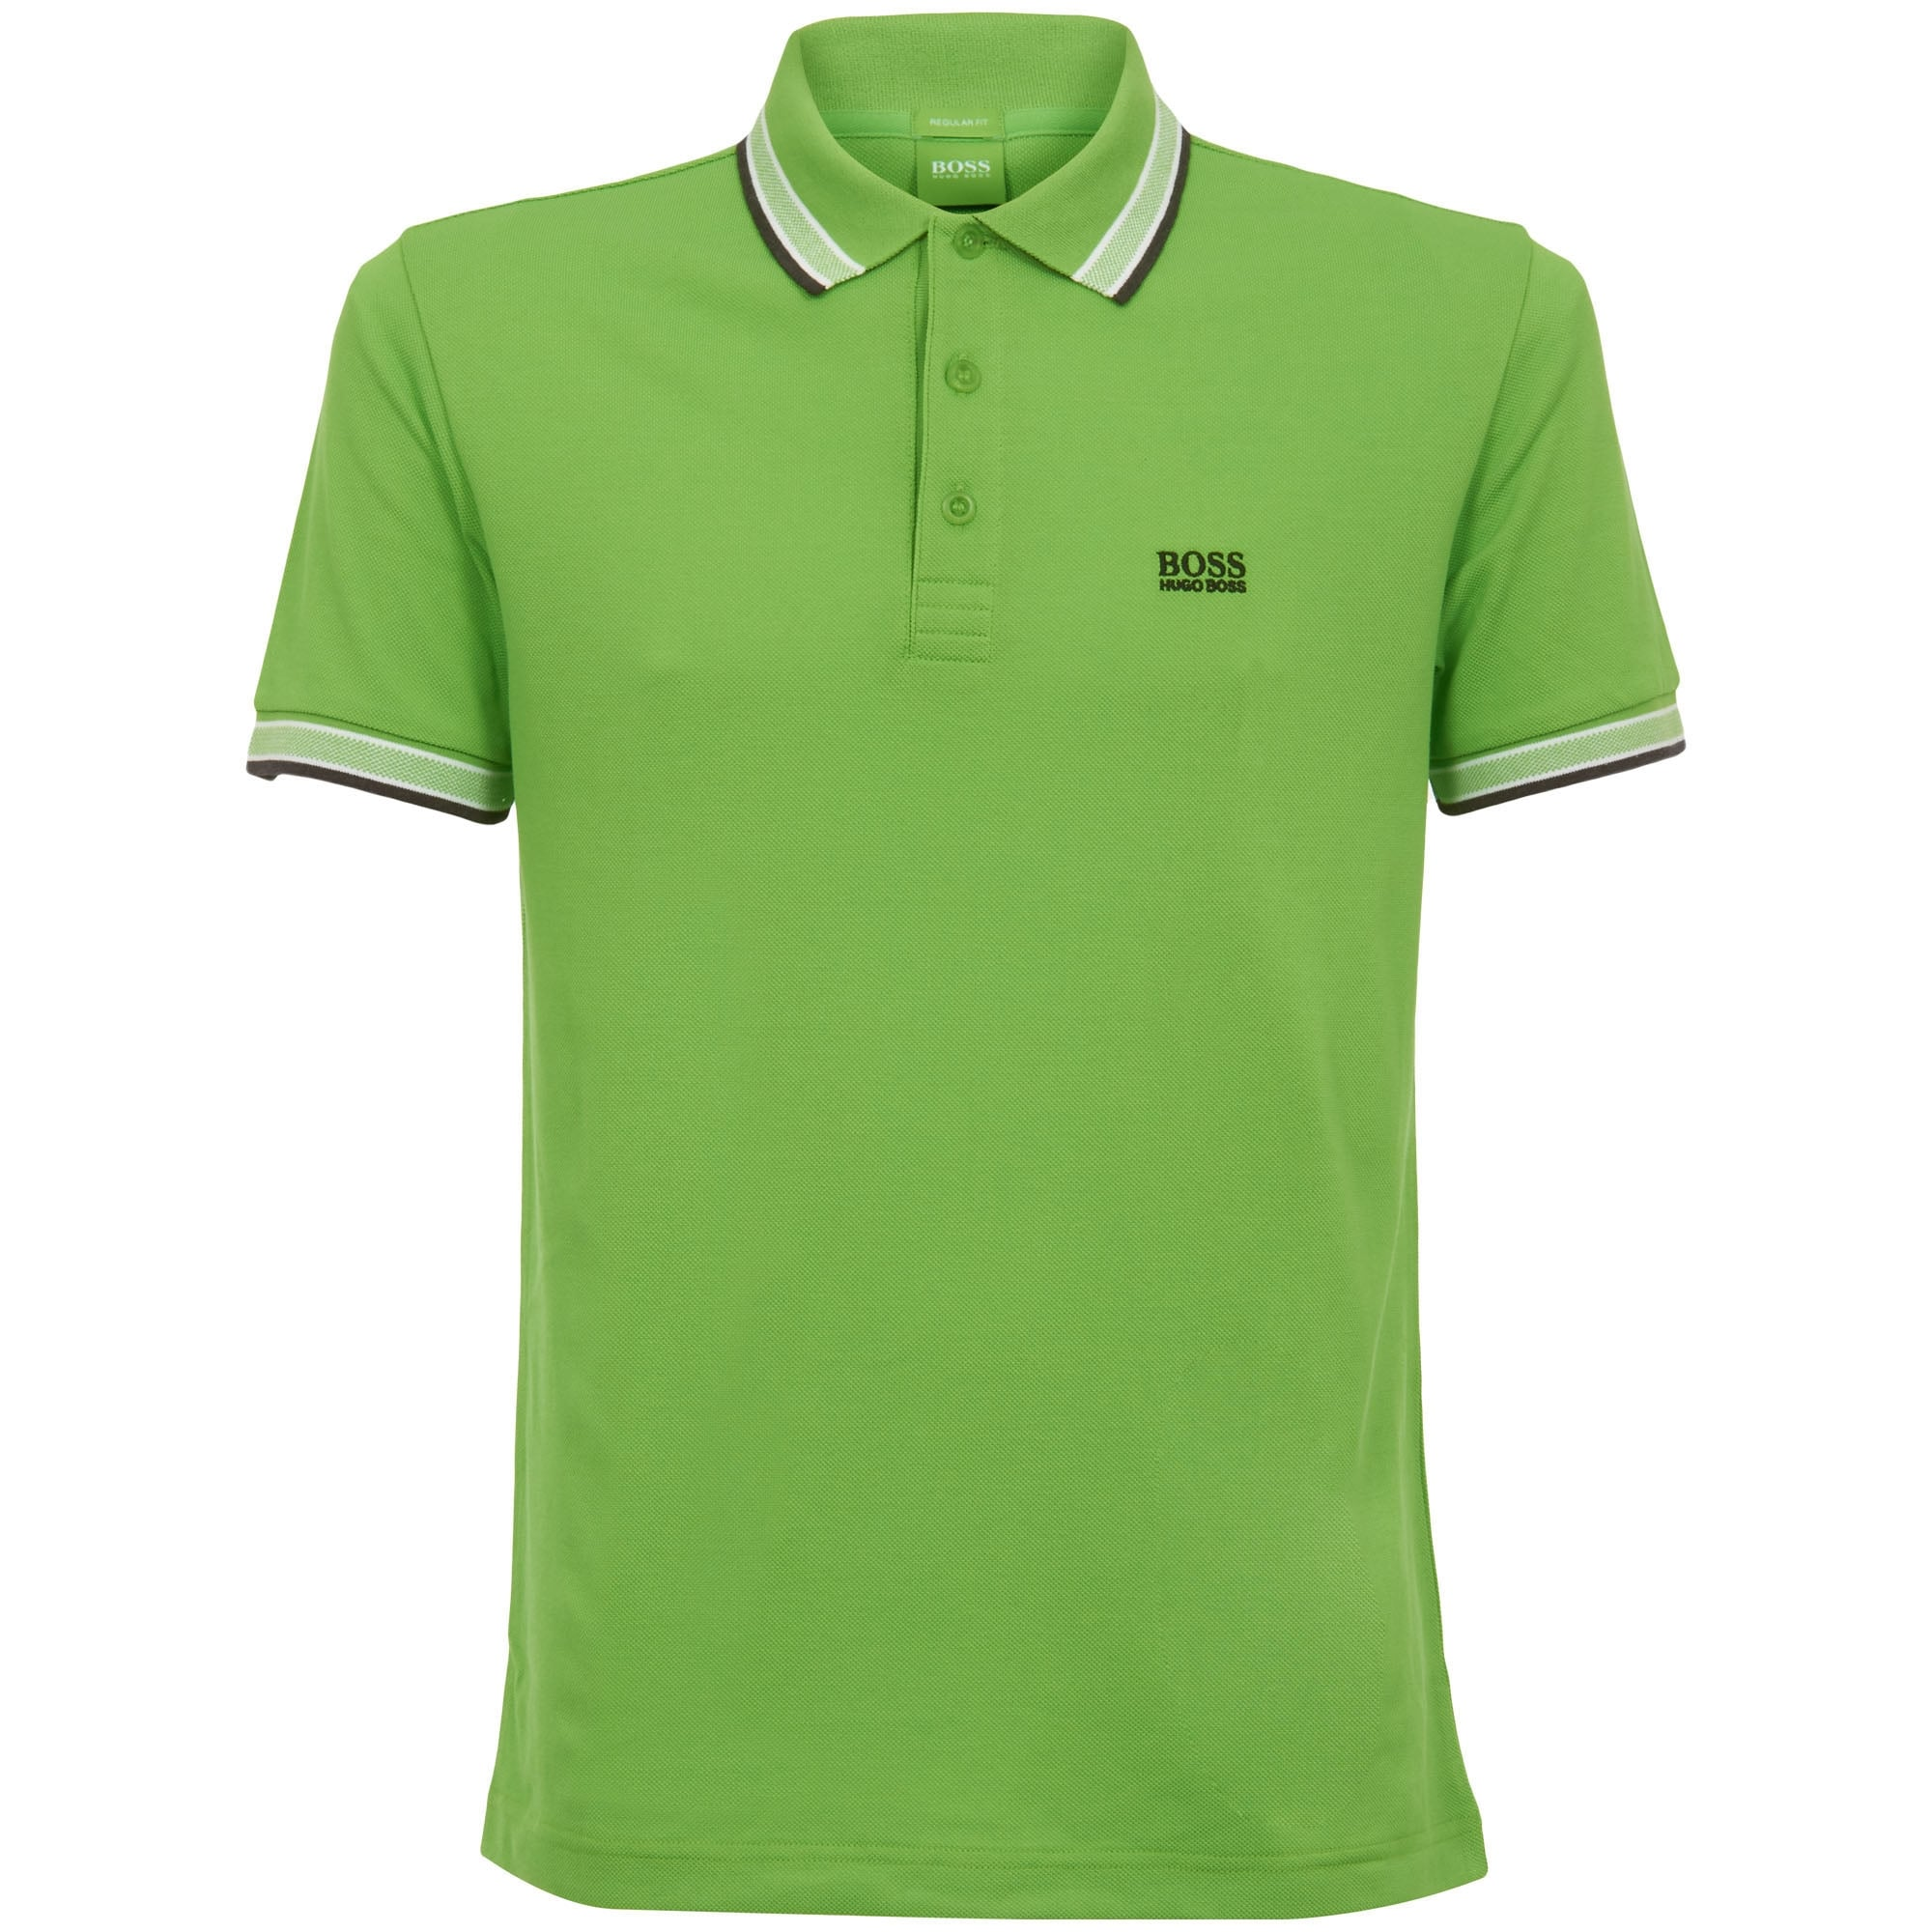 hugo boss green polo shirt 50302557 stuarts london usa. Black Bedroom Furniture Sets. Home Design Ideas